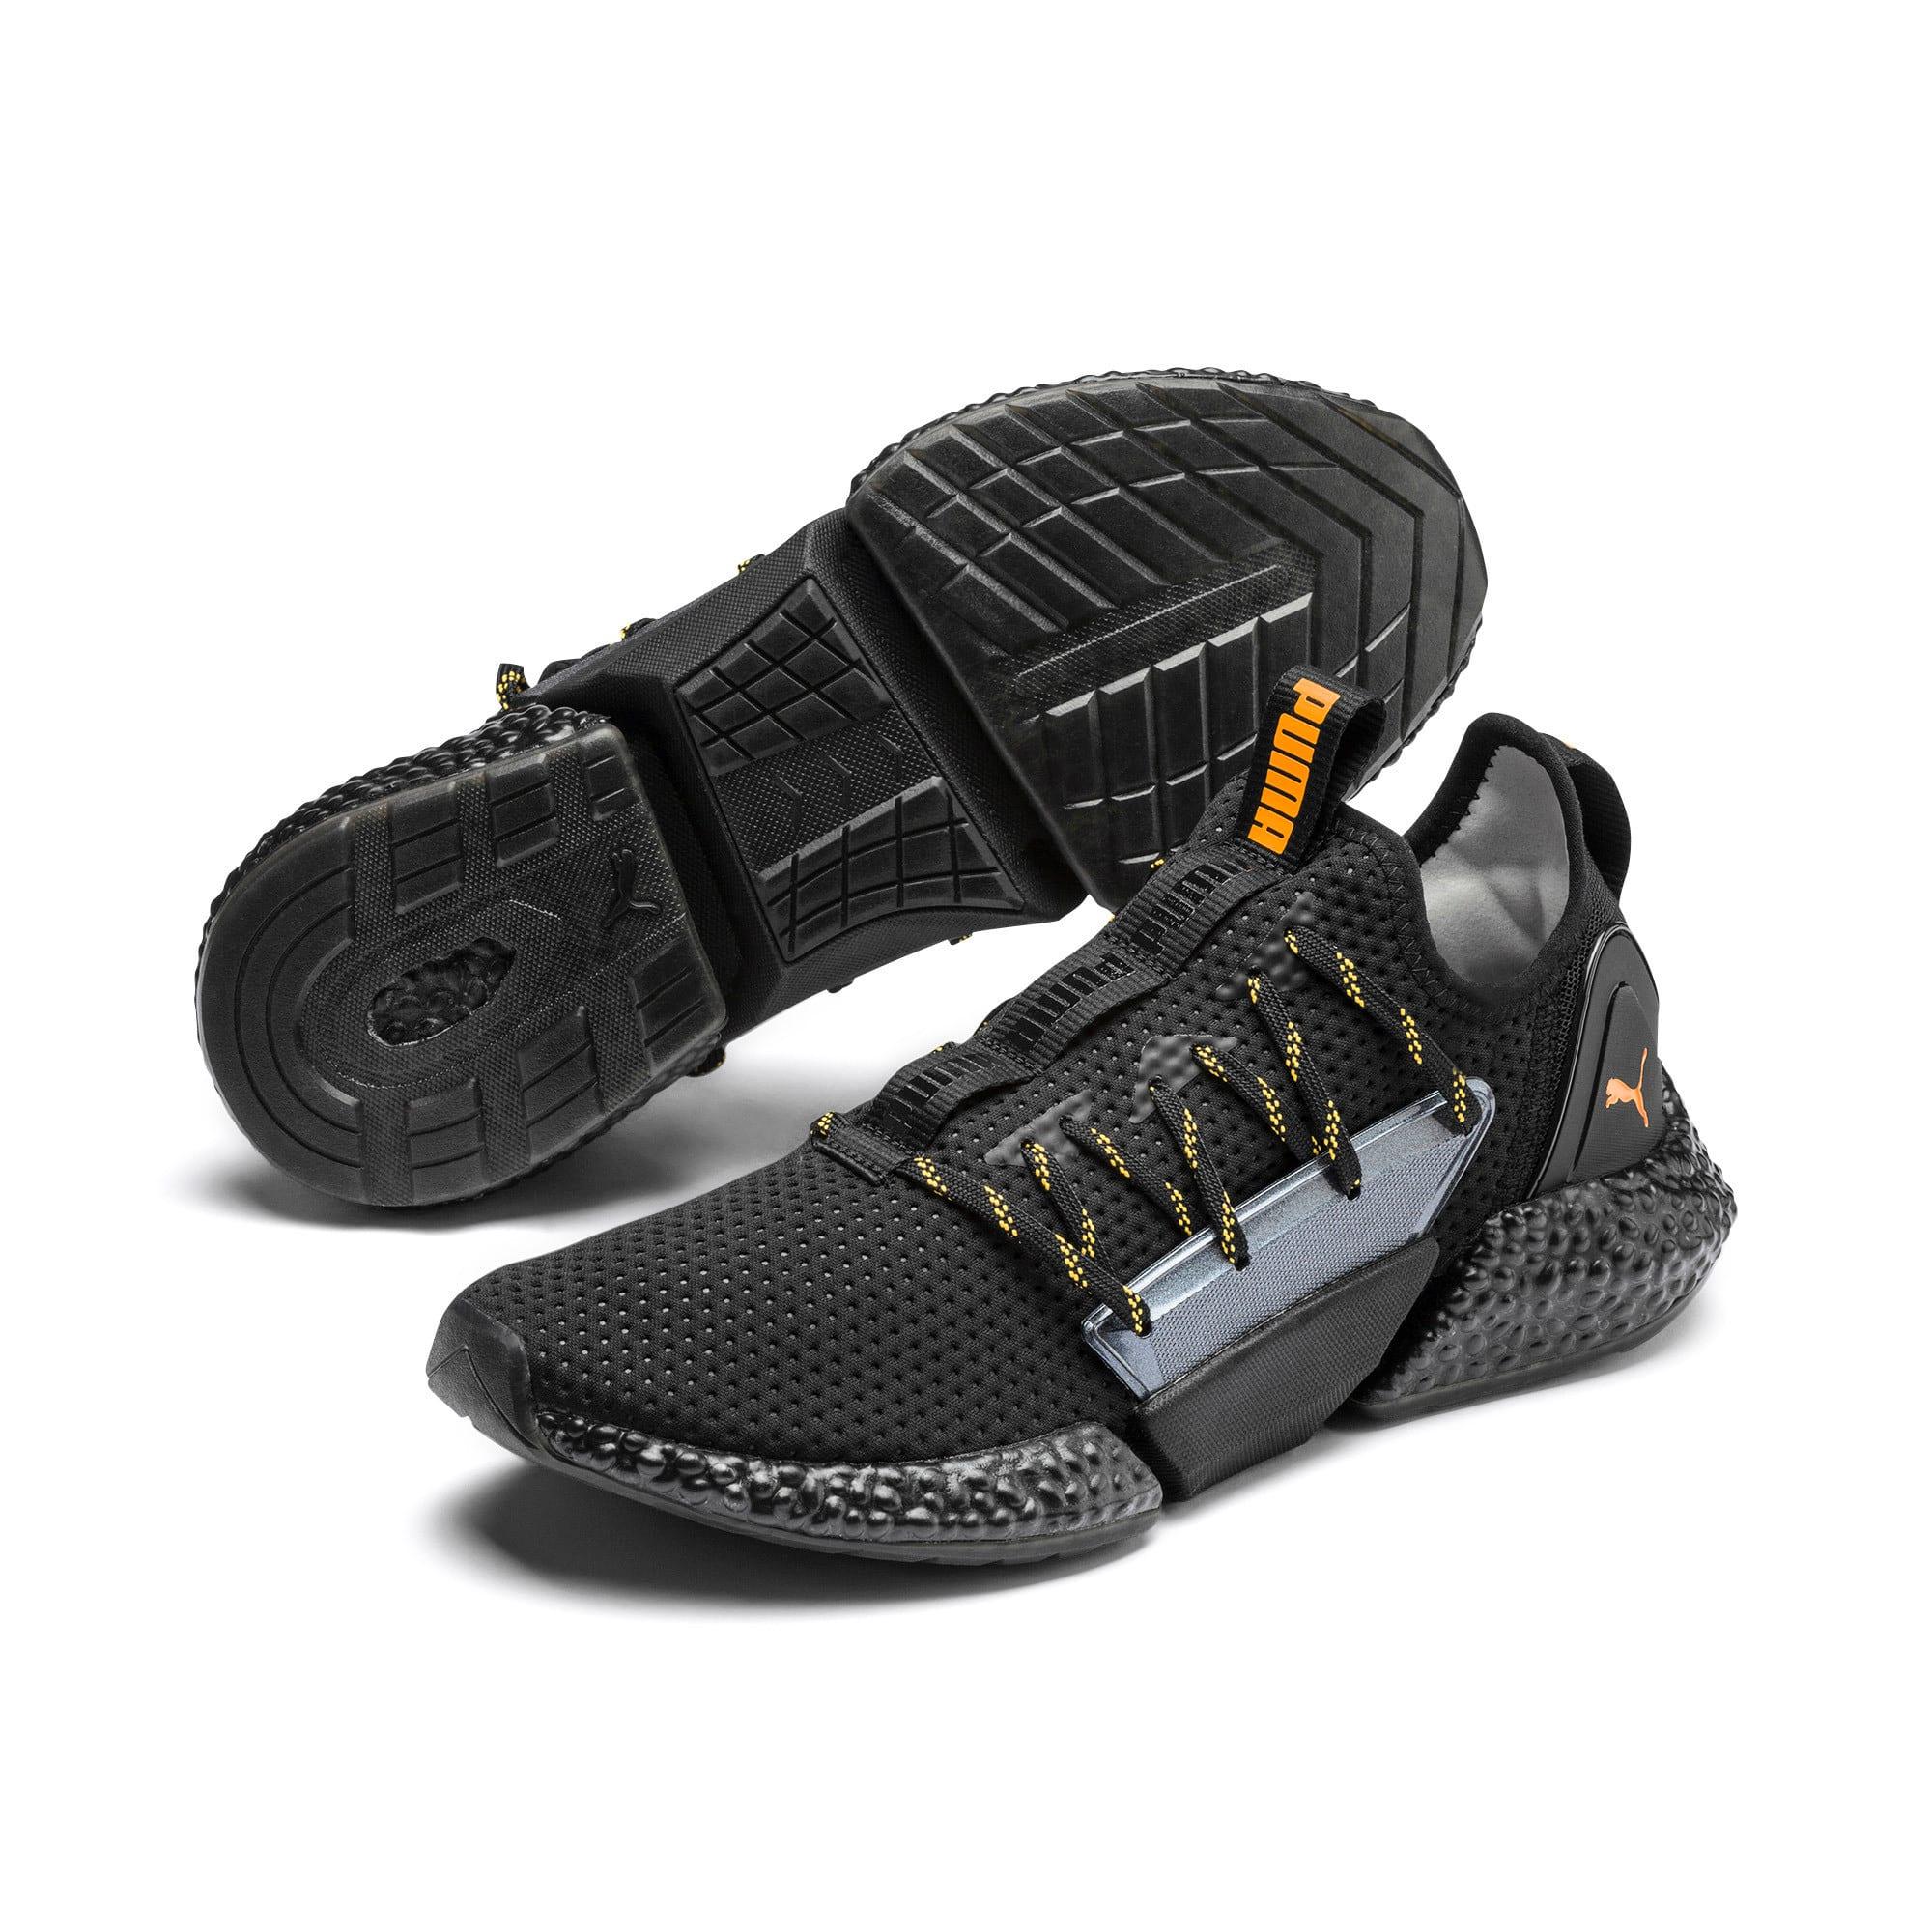 Thumbnail 3 of HYBRID Rocket Aero Men's Running Shoes, Puma Black-Puma Black, medium